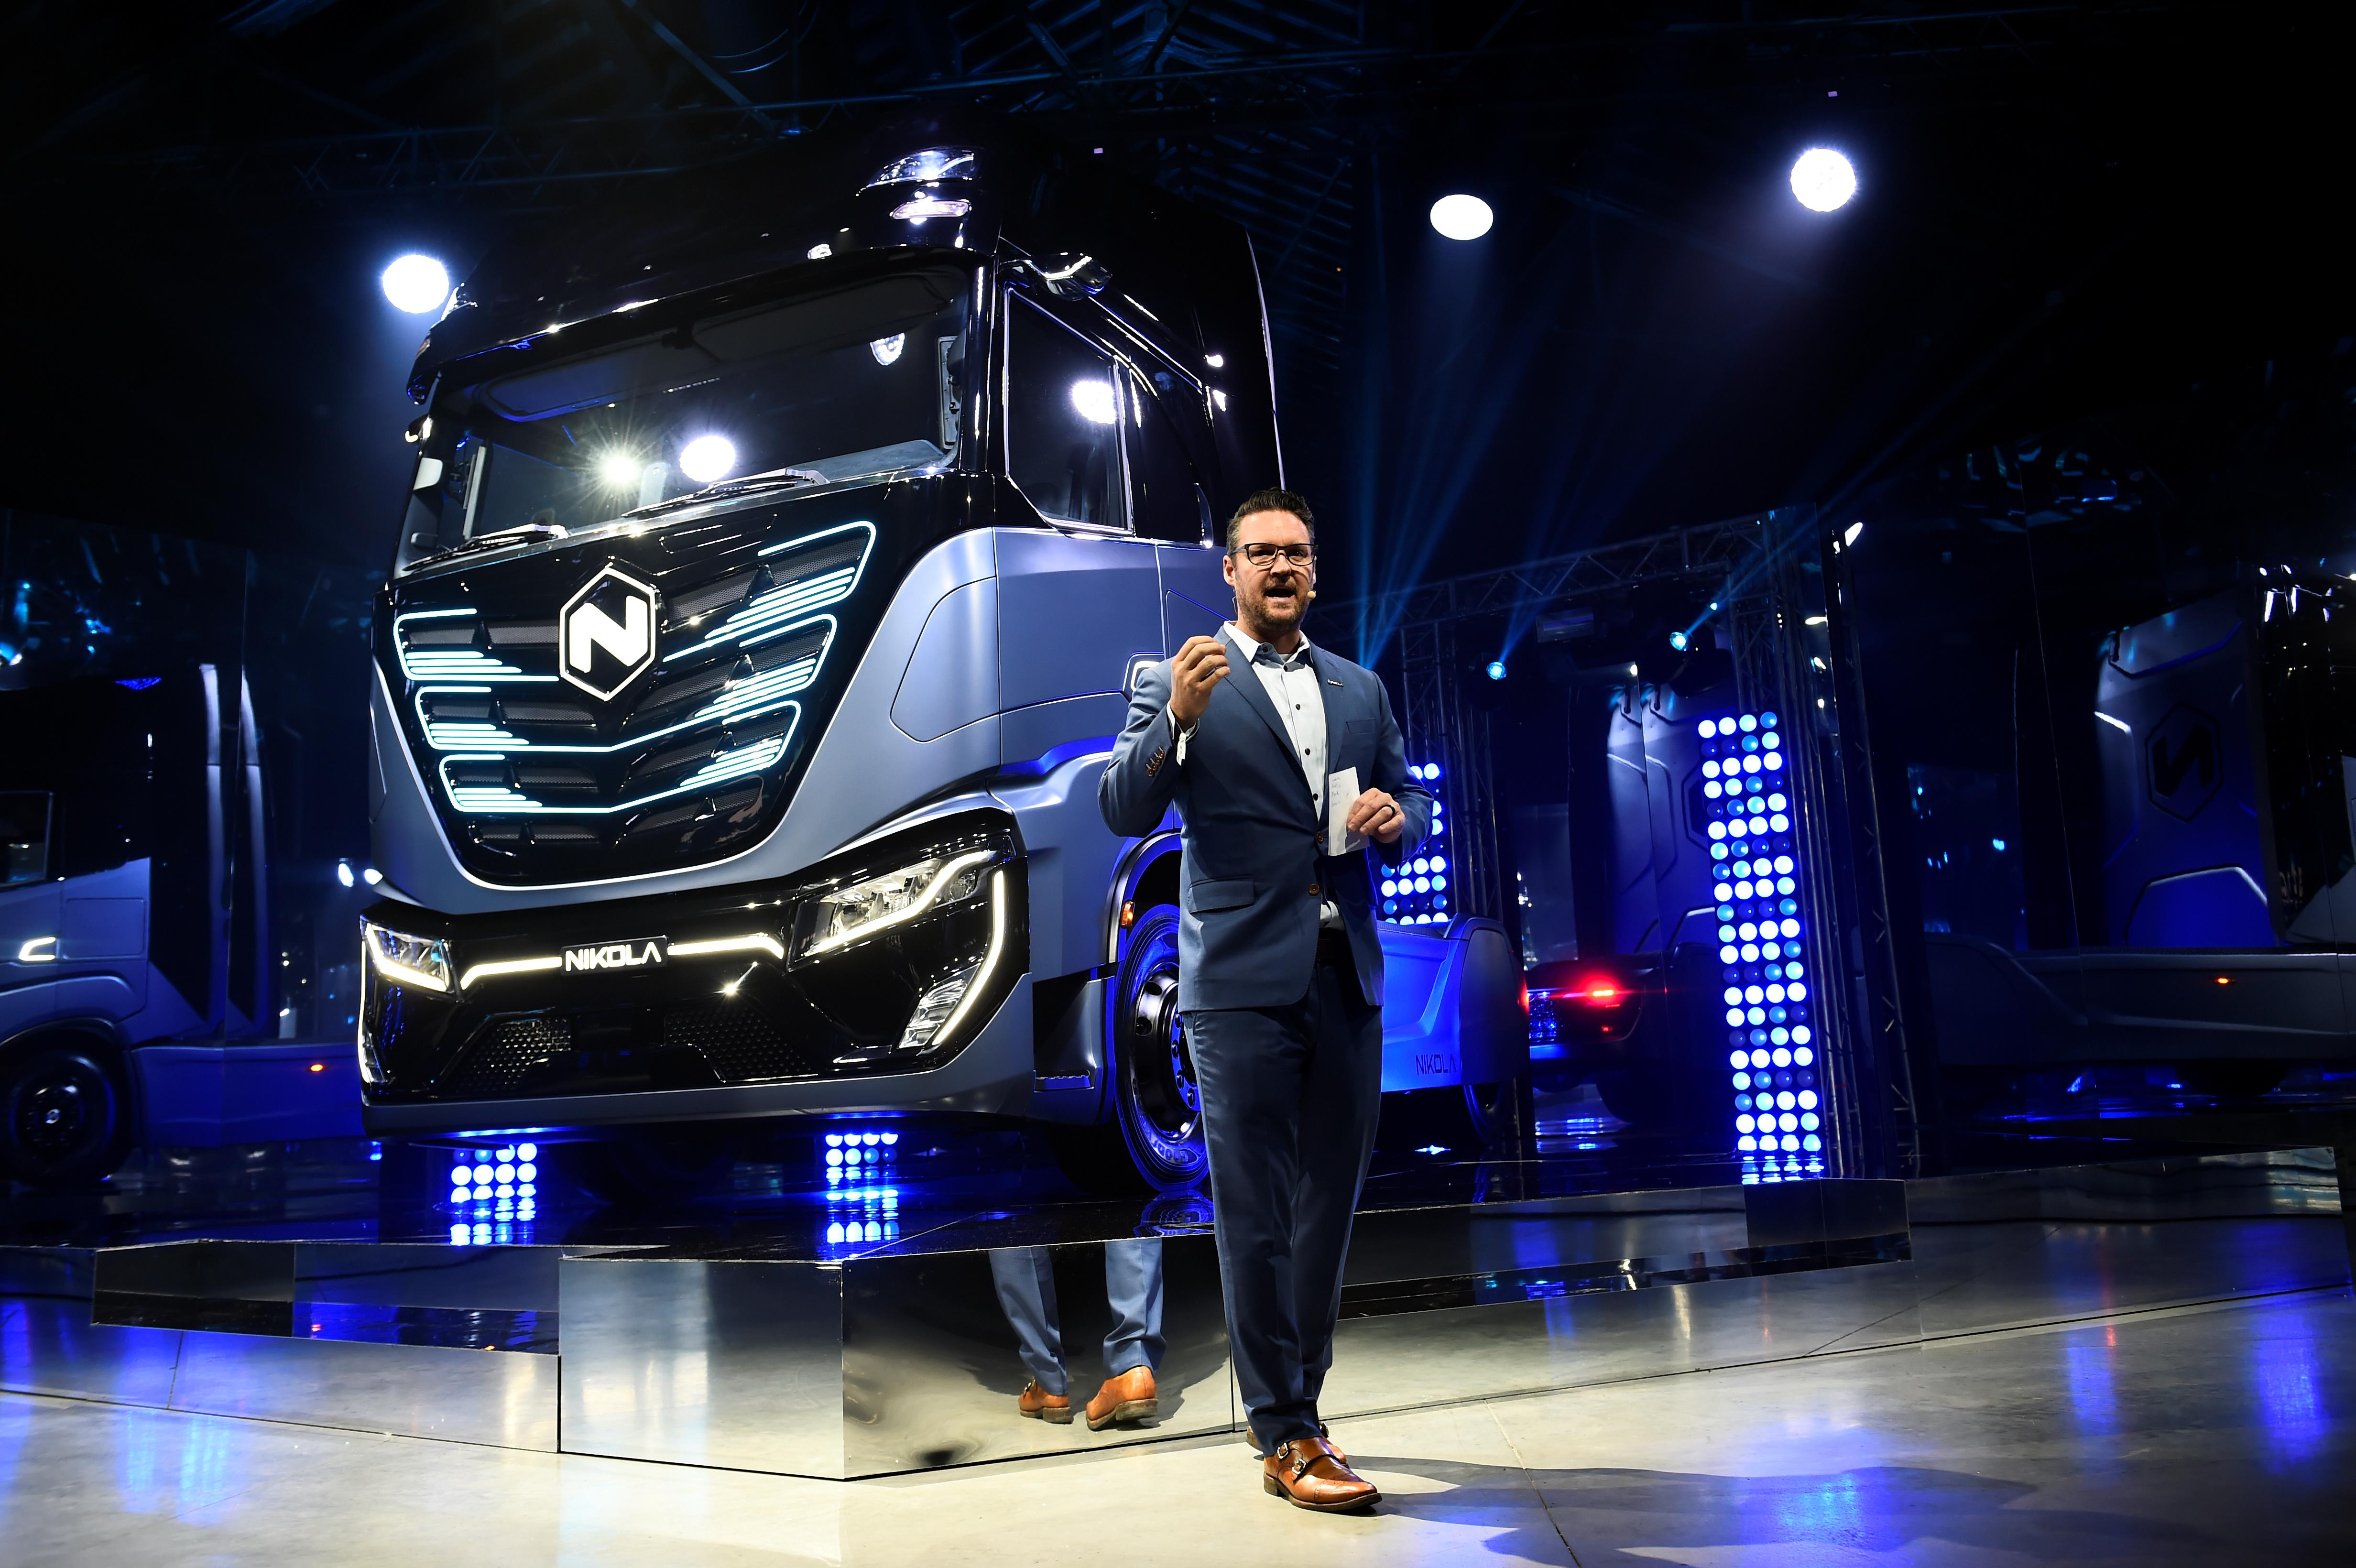 GM sticks by Nikola as the EV maker's stock plunges after founder Trevor Milton exits